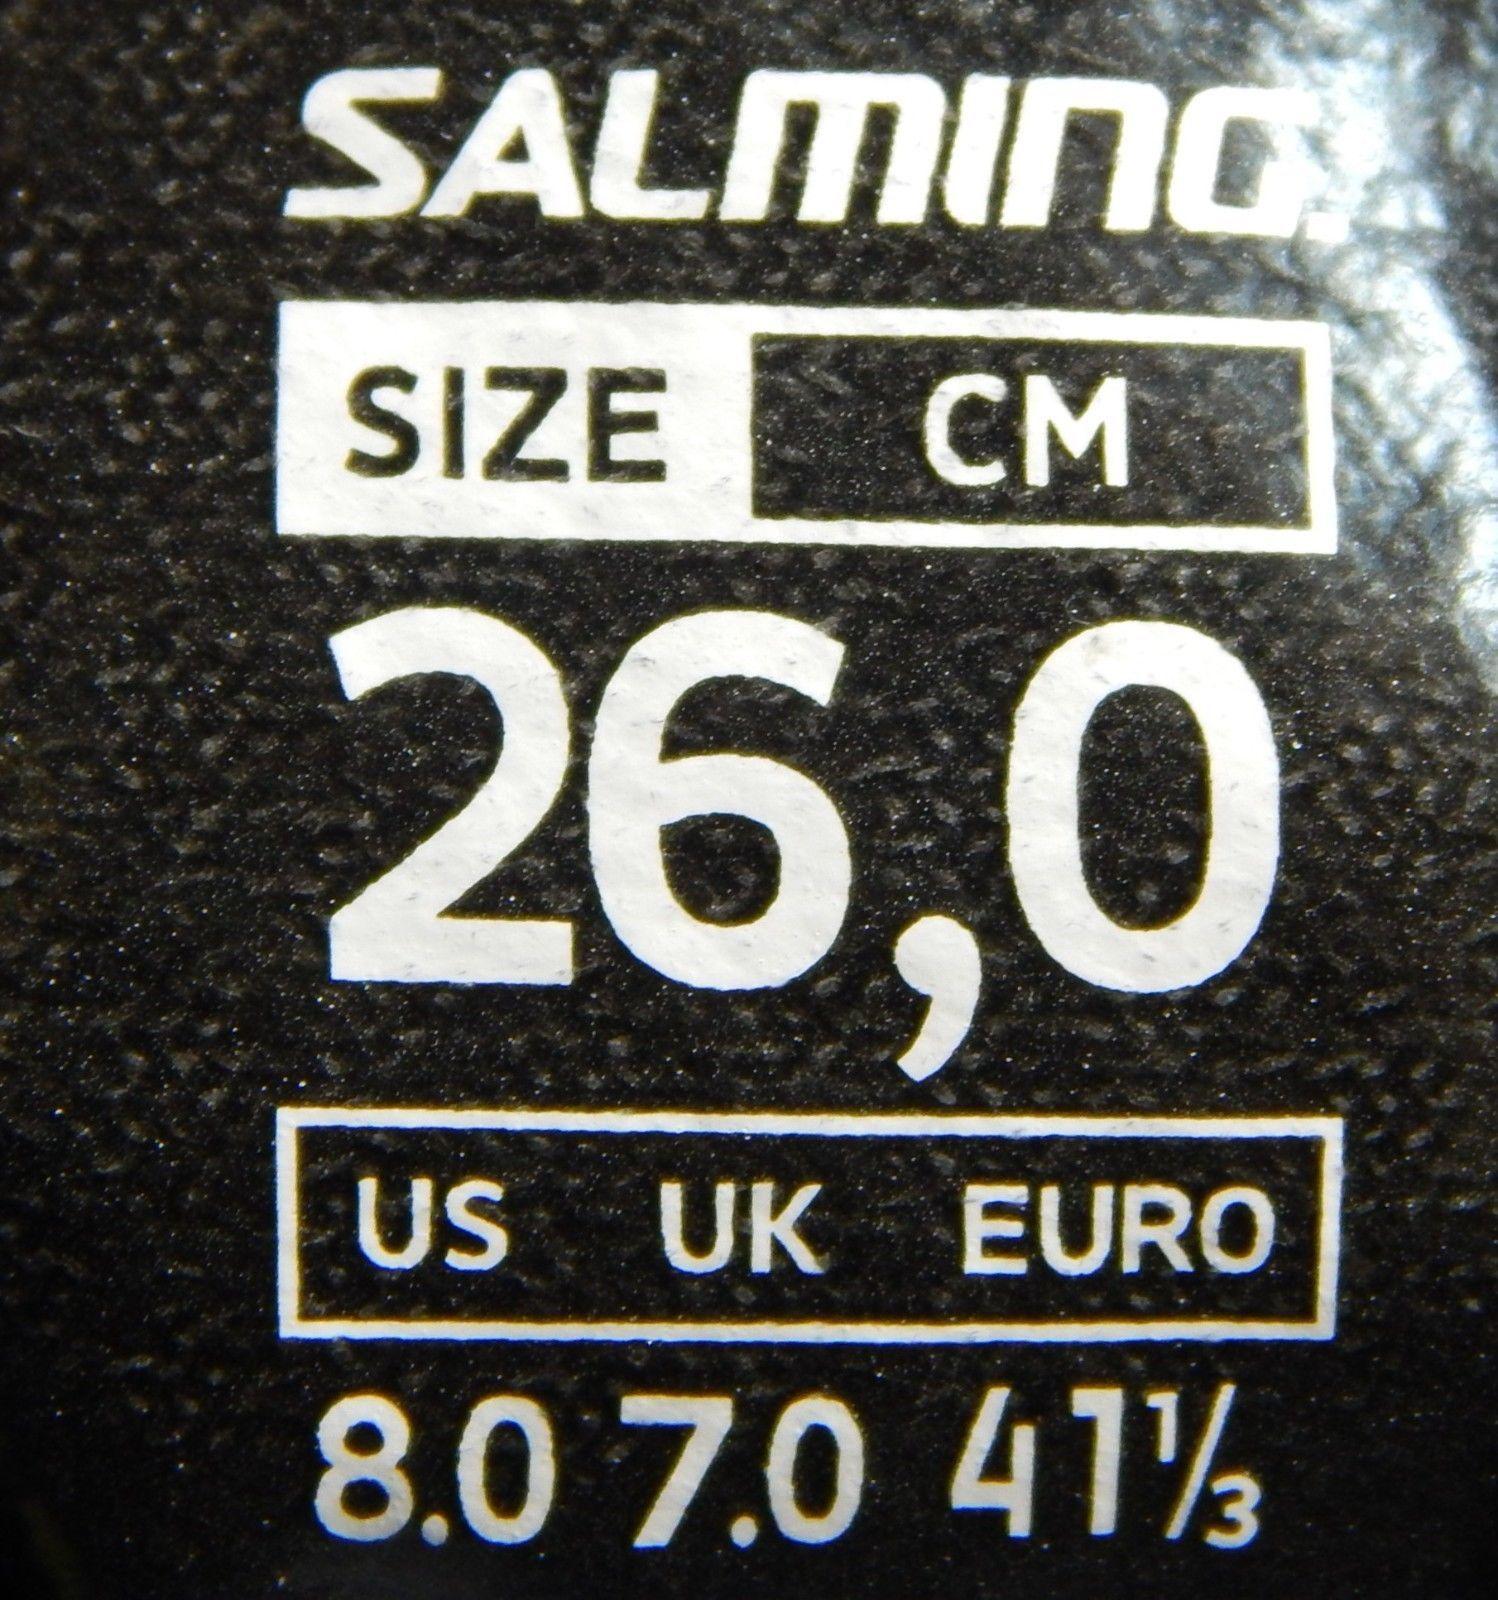 Salming Distance D1 Men's Running Shoes Size US 8 M (D) EU 41 1/3 Yellow 26 cm